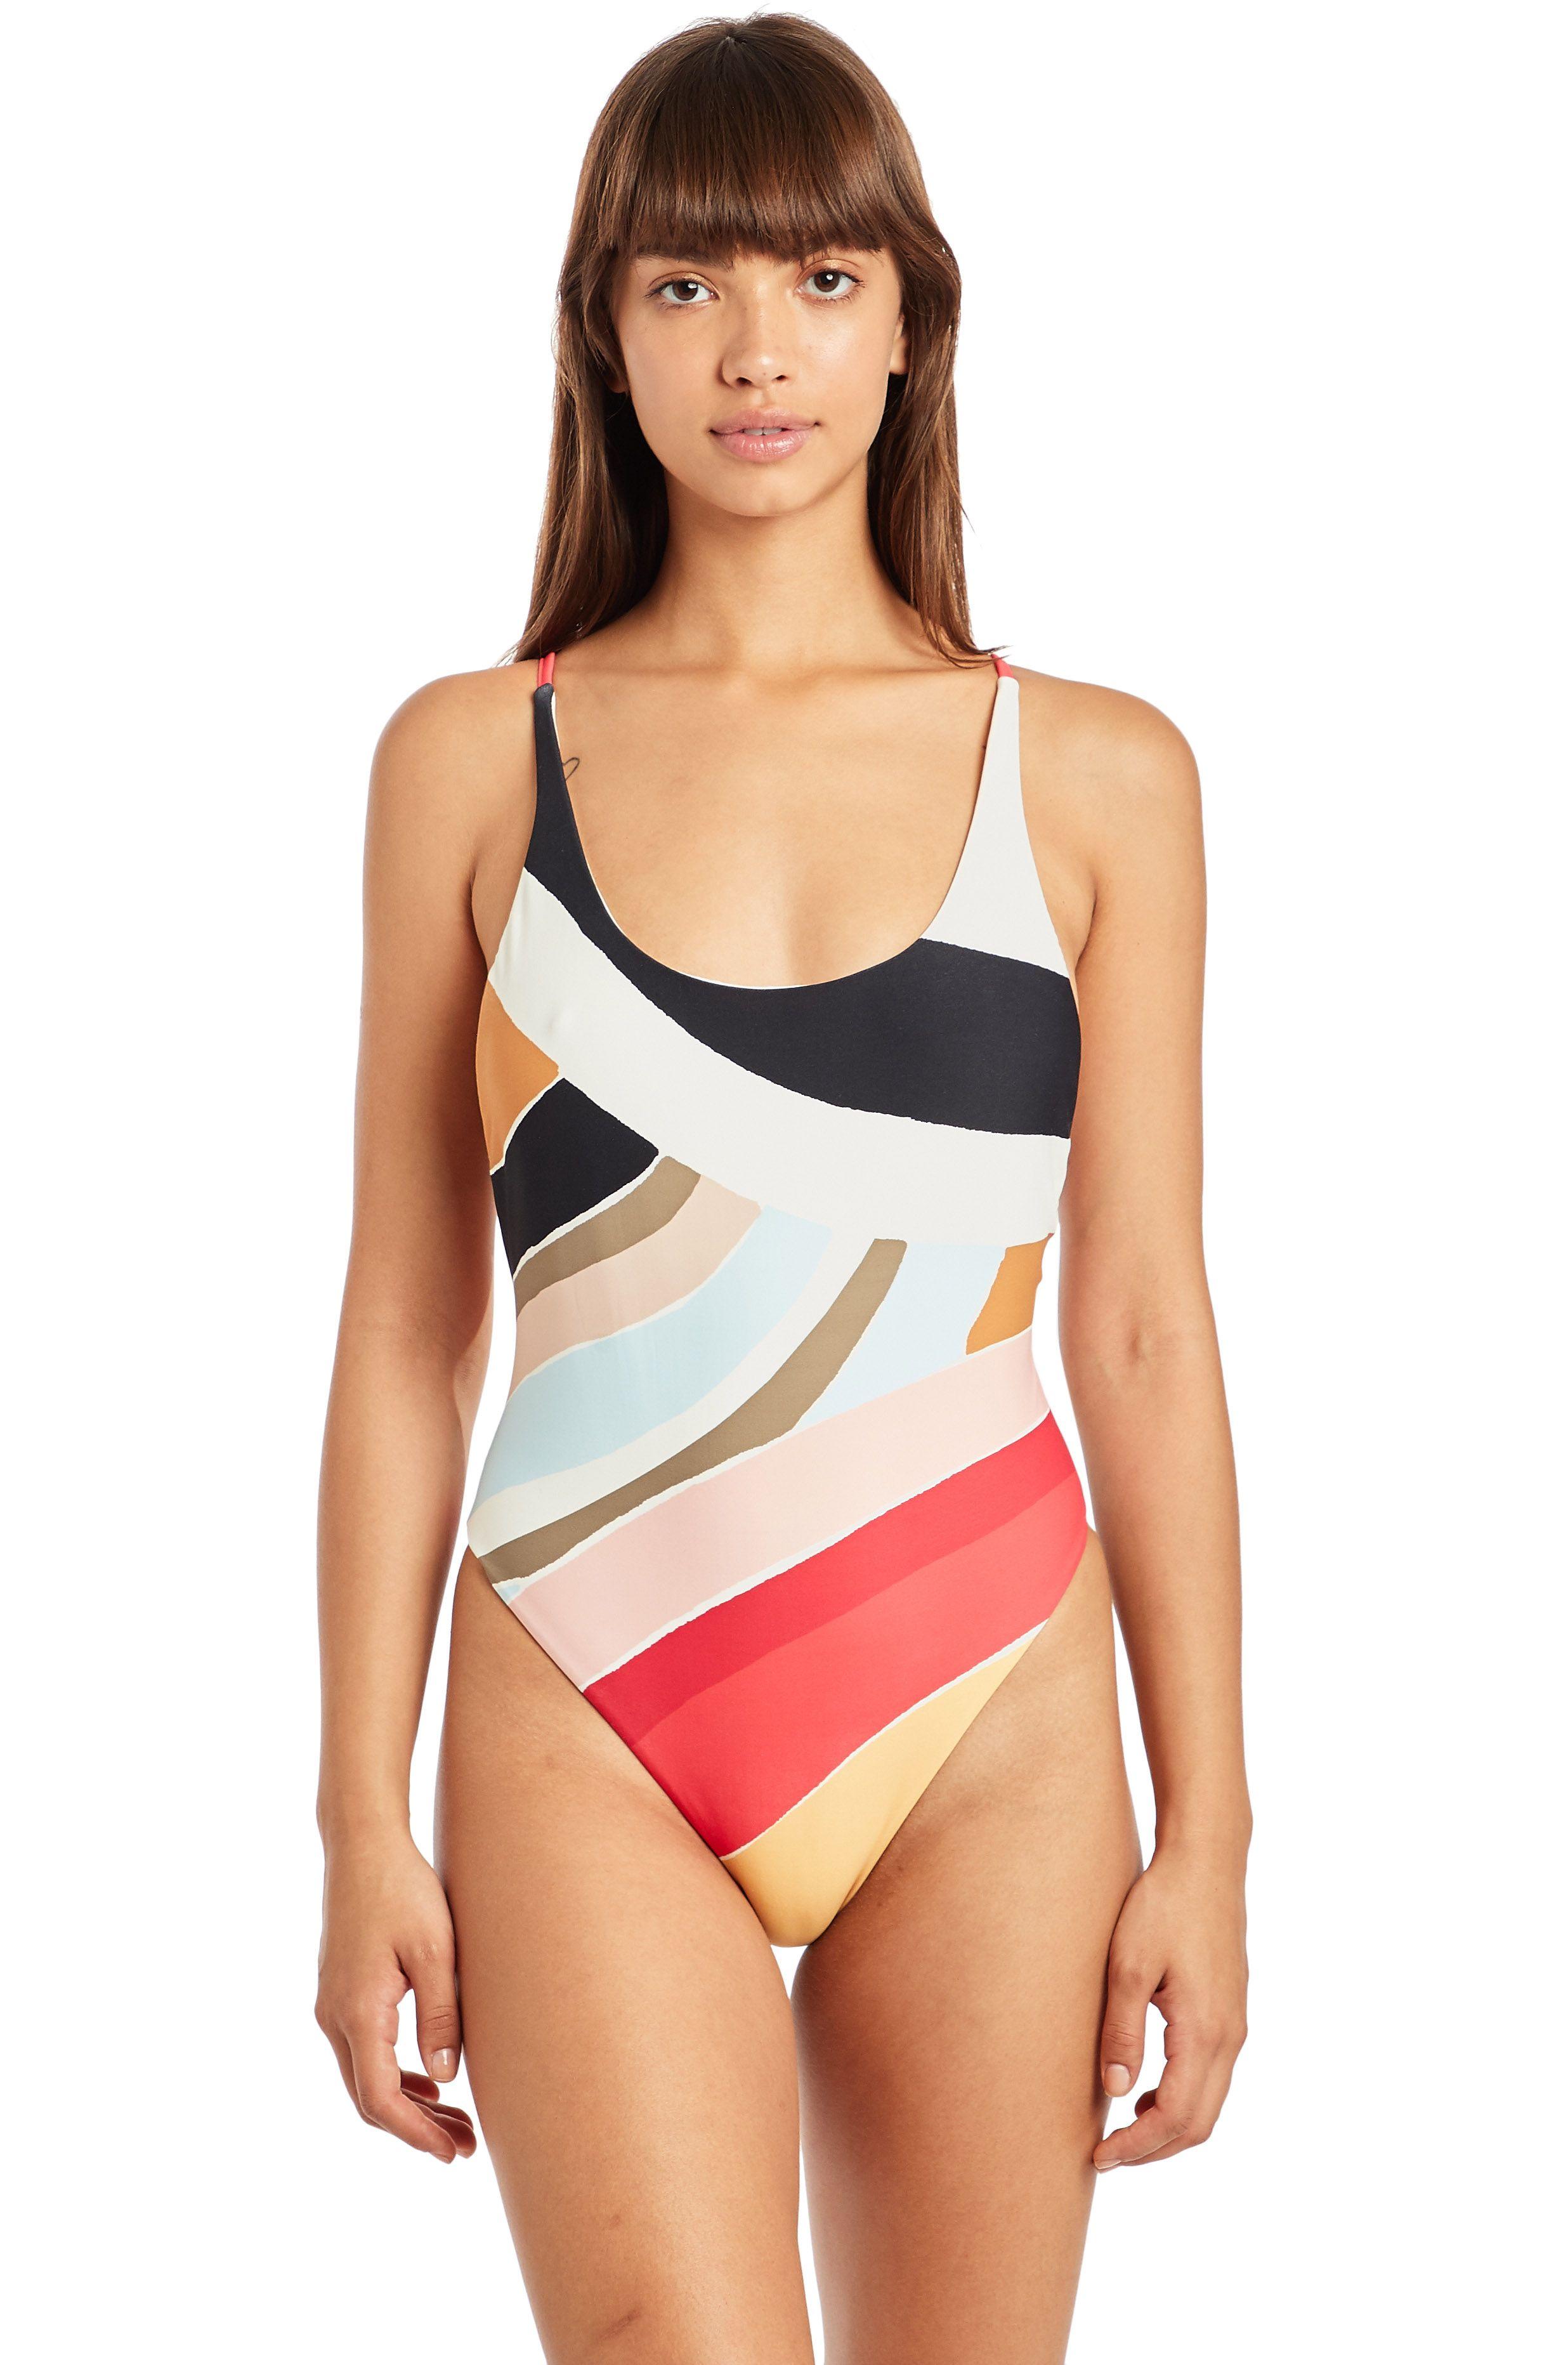 Billabong Swimsuit SUNGAZER SEEKERS OF THE SUN Multi